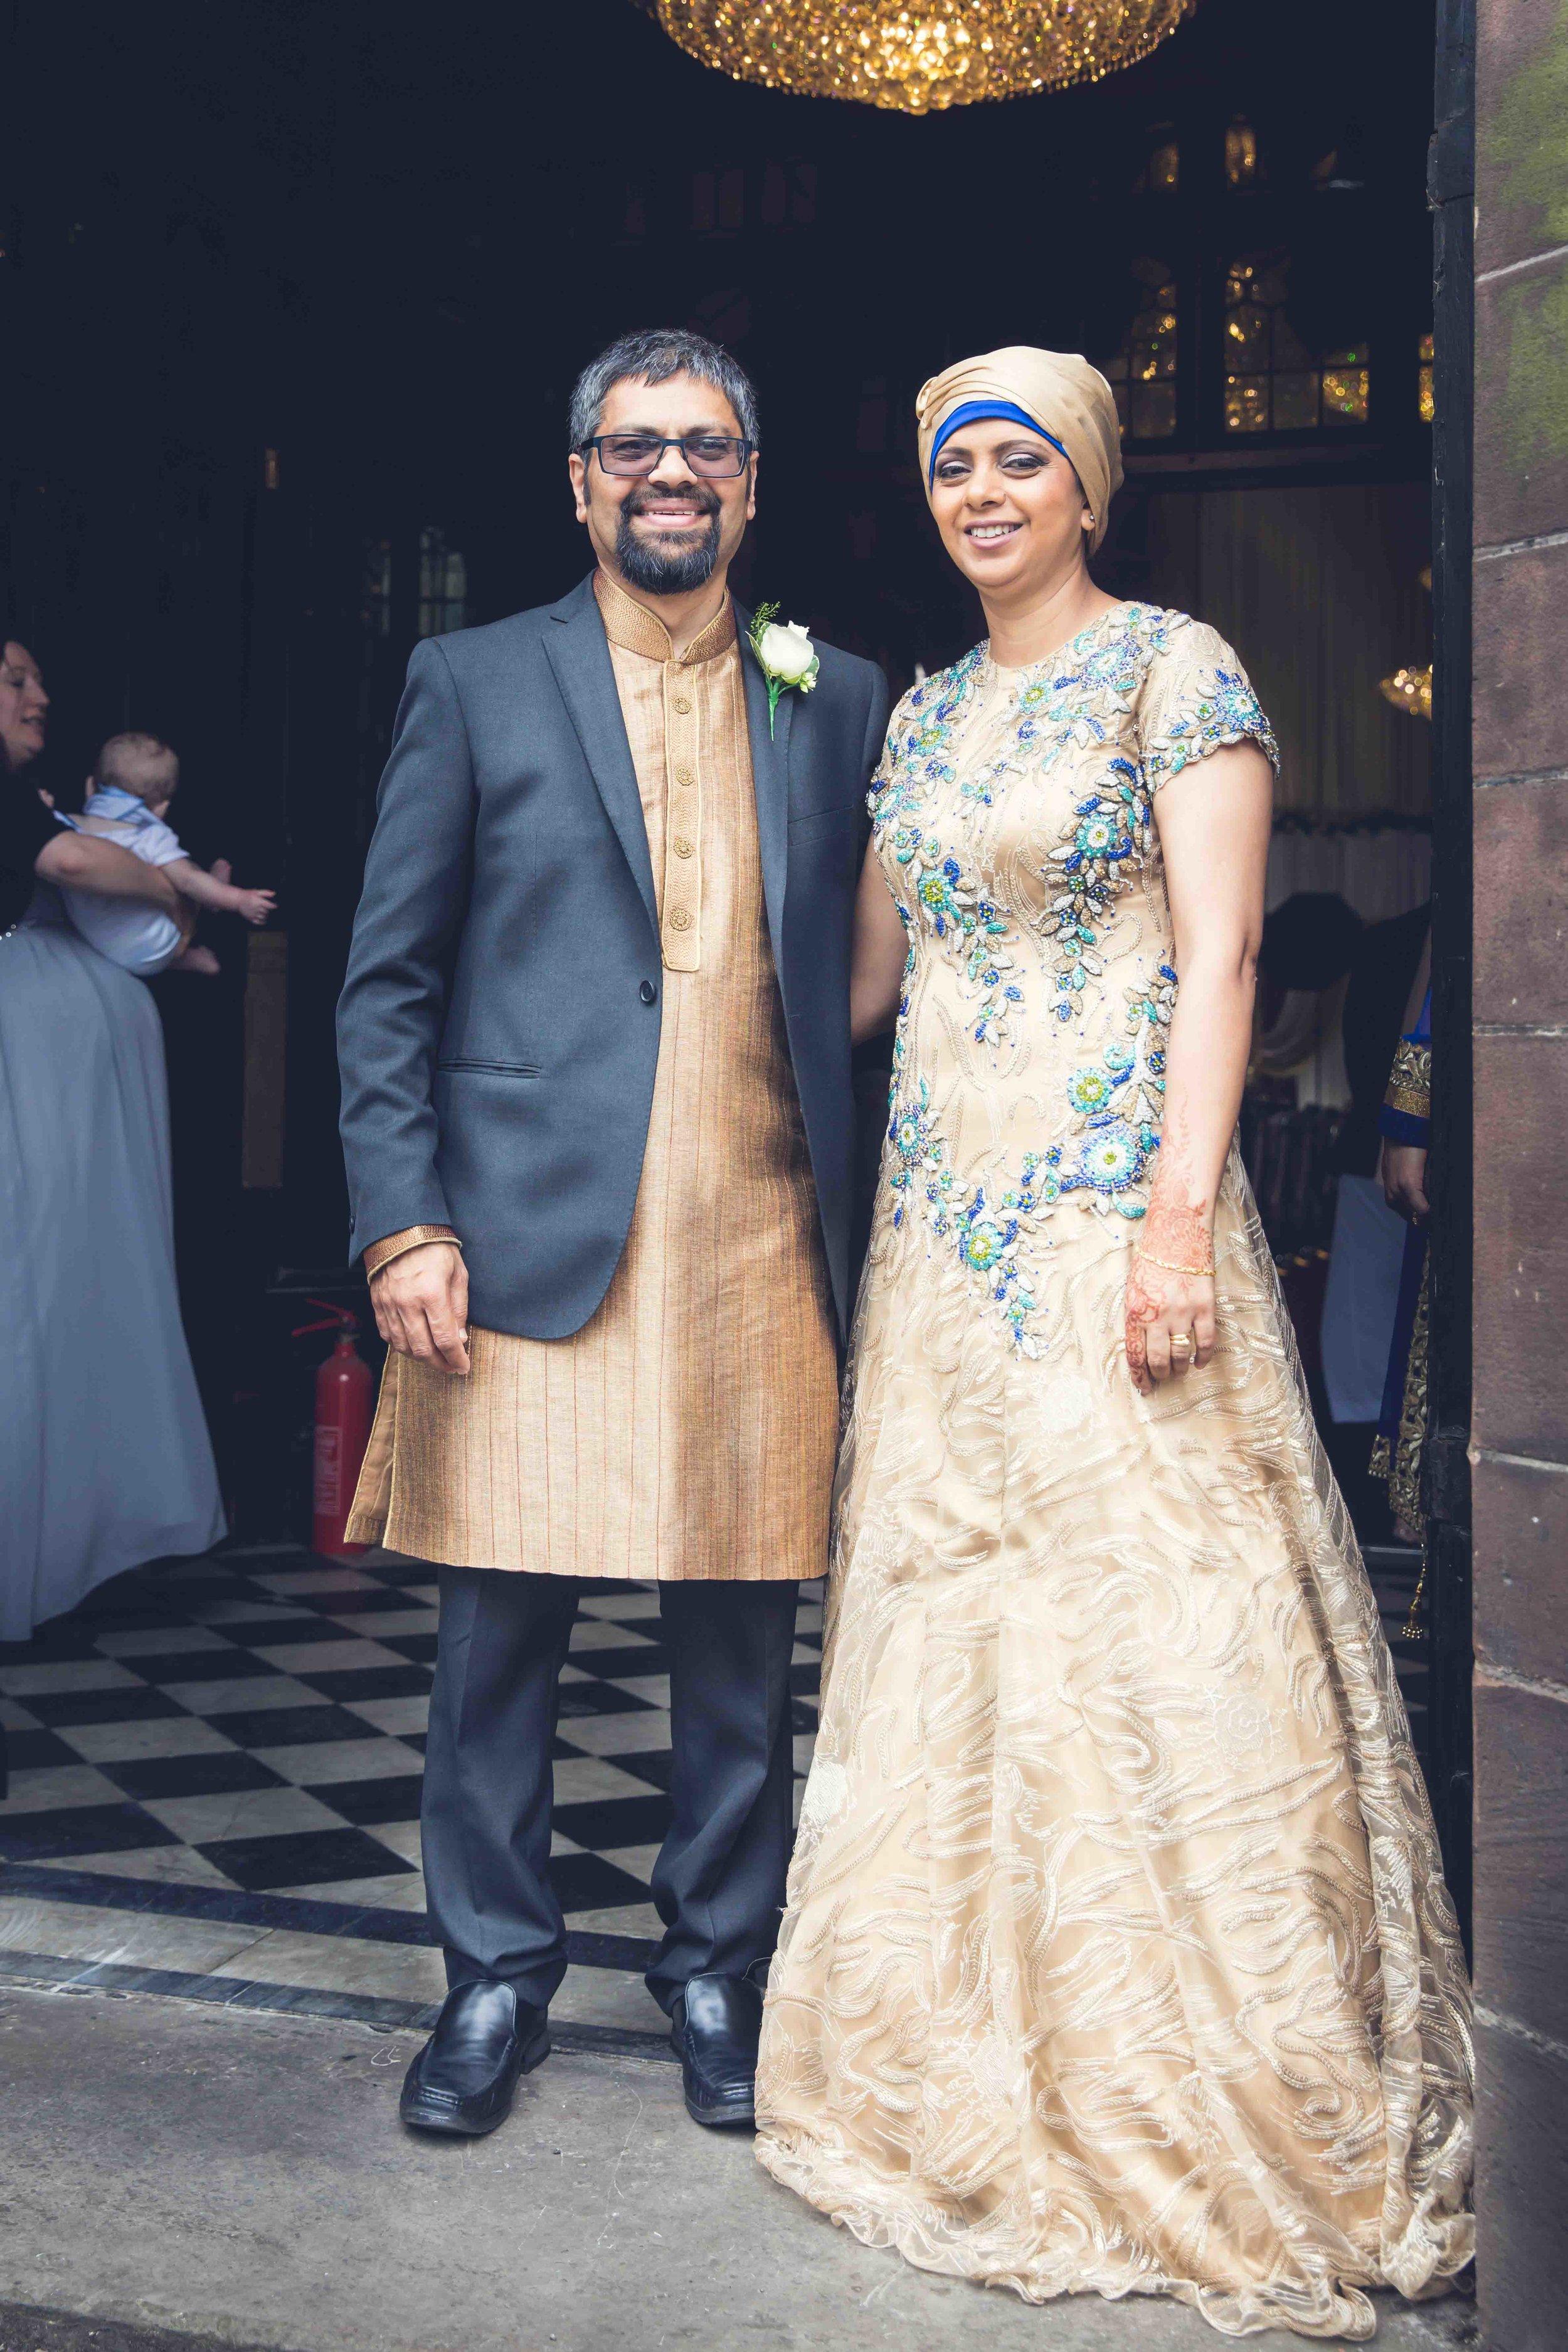 Asian Wedding Photographer Opu Sultan Photography Lyme Park Scotland Edinburgh Glasgow London Manchester Liverpool Birmingham Wedding Photos prewed shoot Jams & Tams Blod-42.jpg